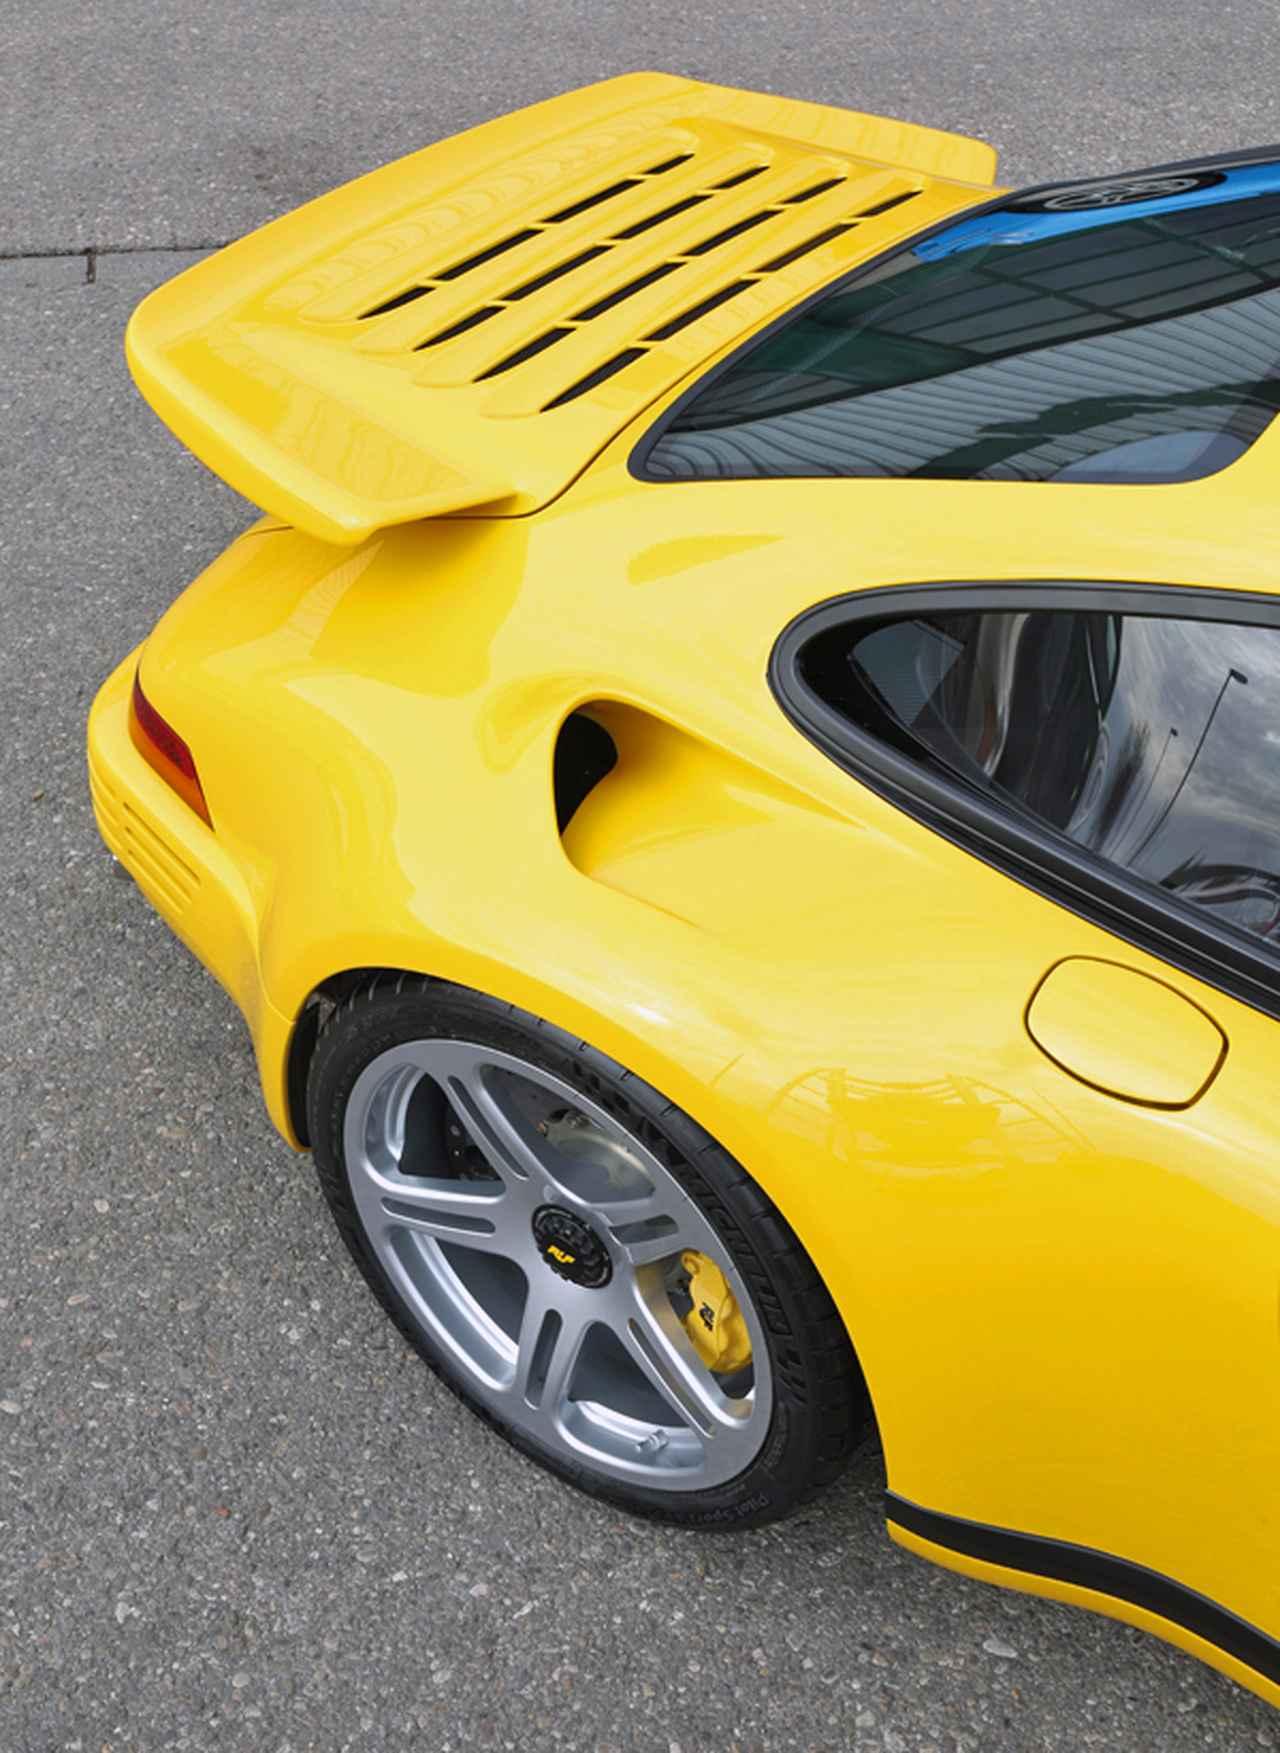 RUFが「CTR アニバーサリー」の生産モデルと「GT」を初公開【2019ジュネーブショー】